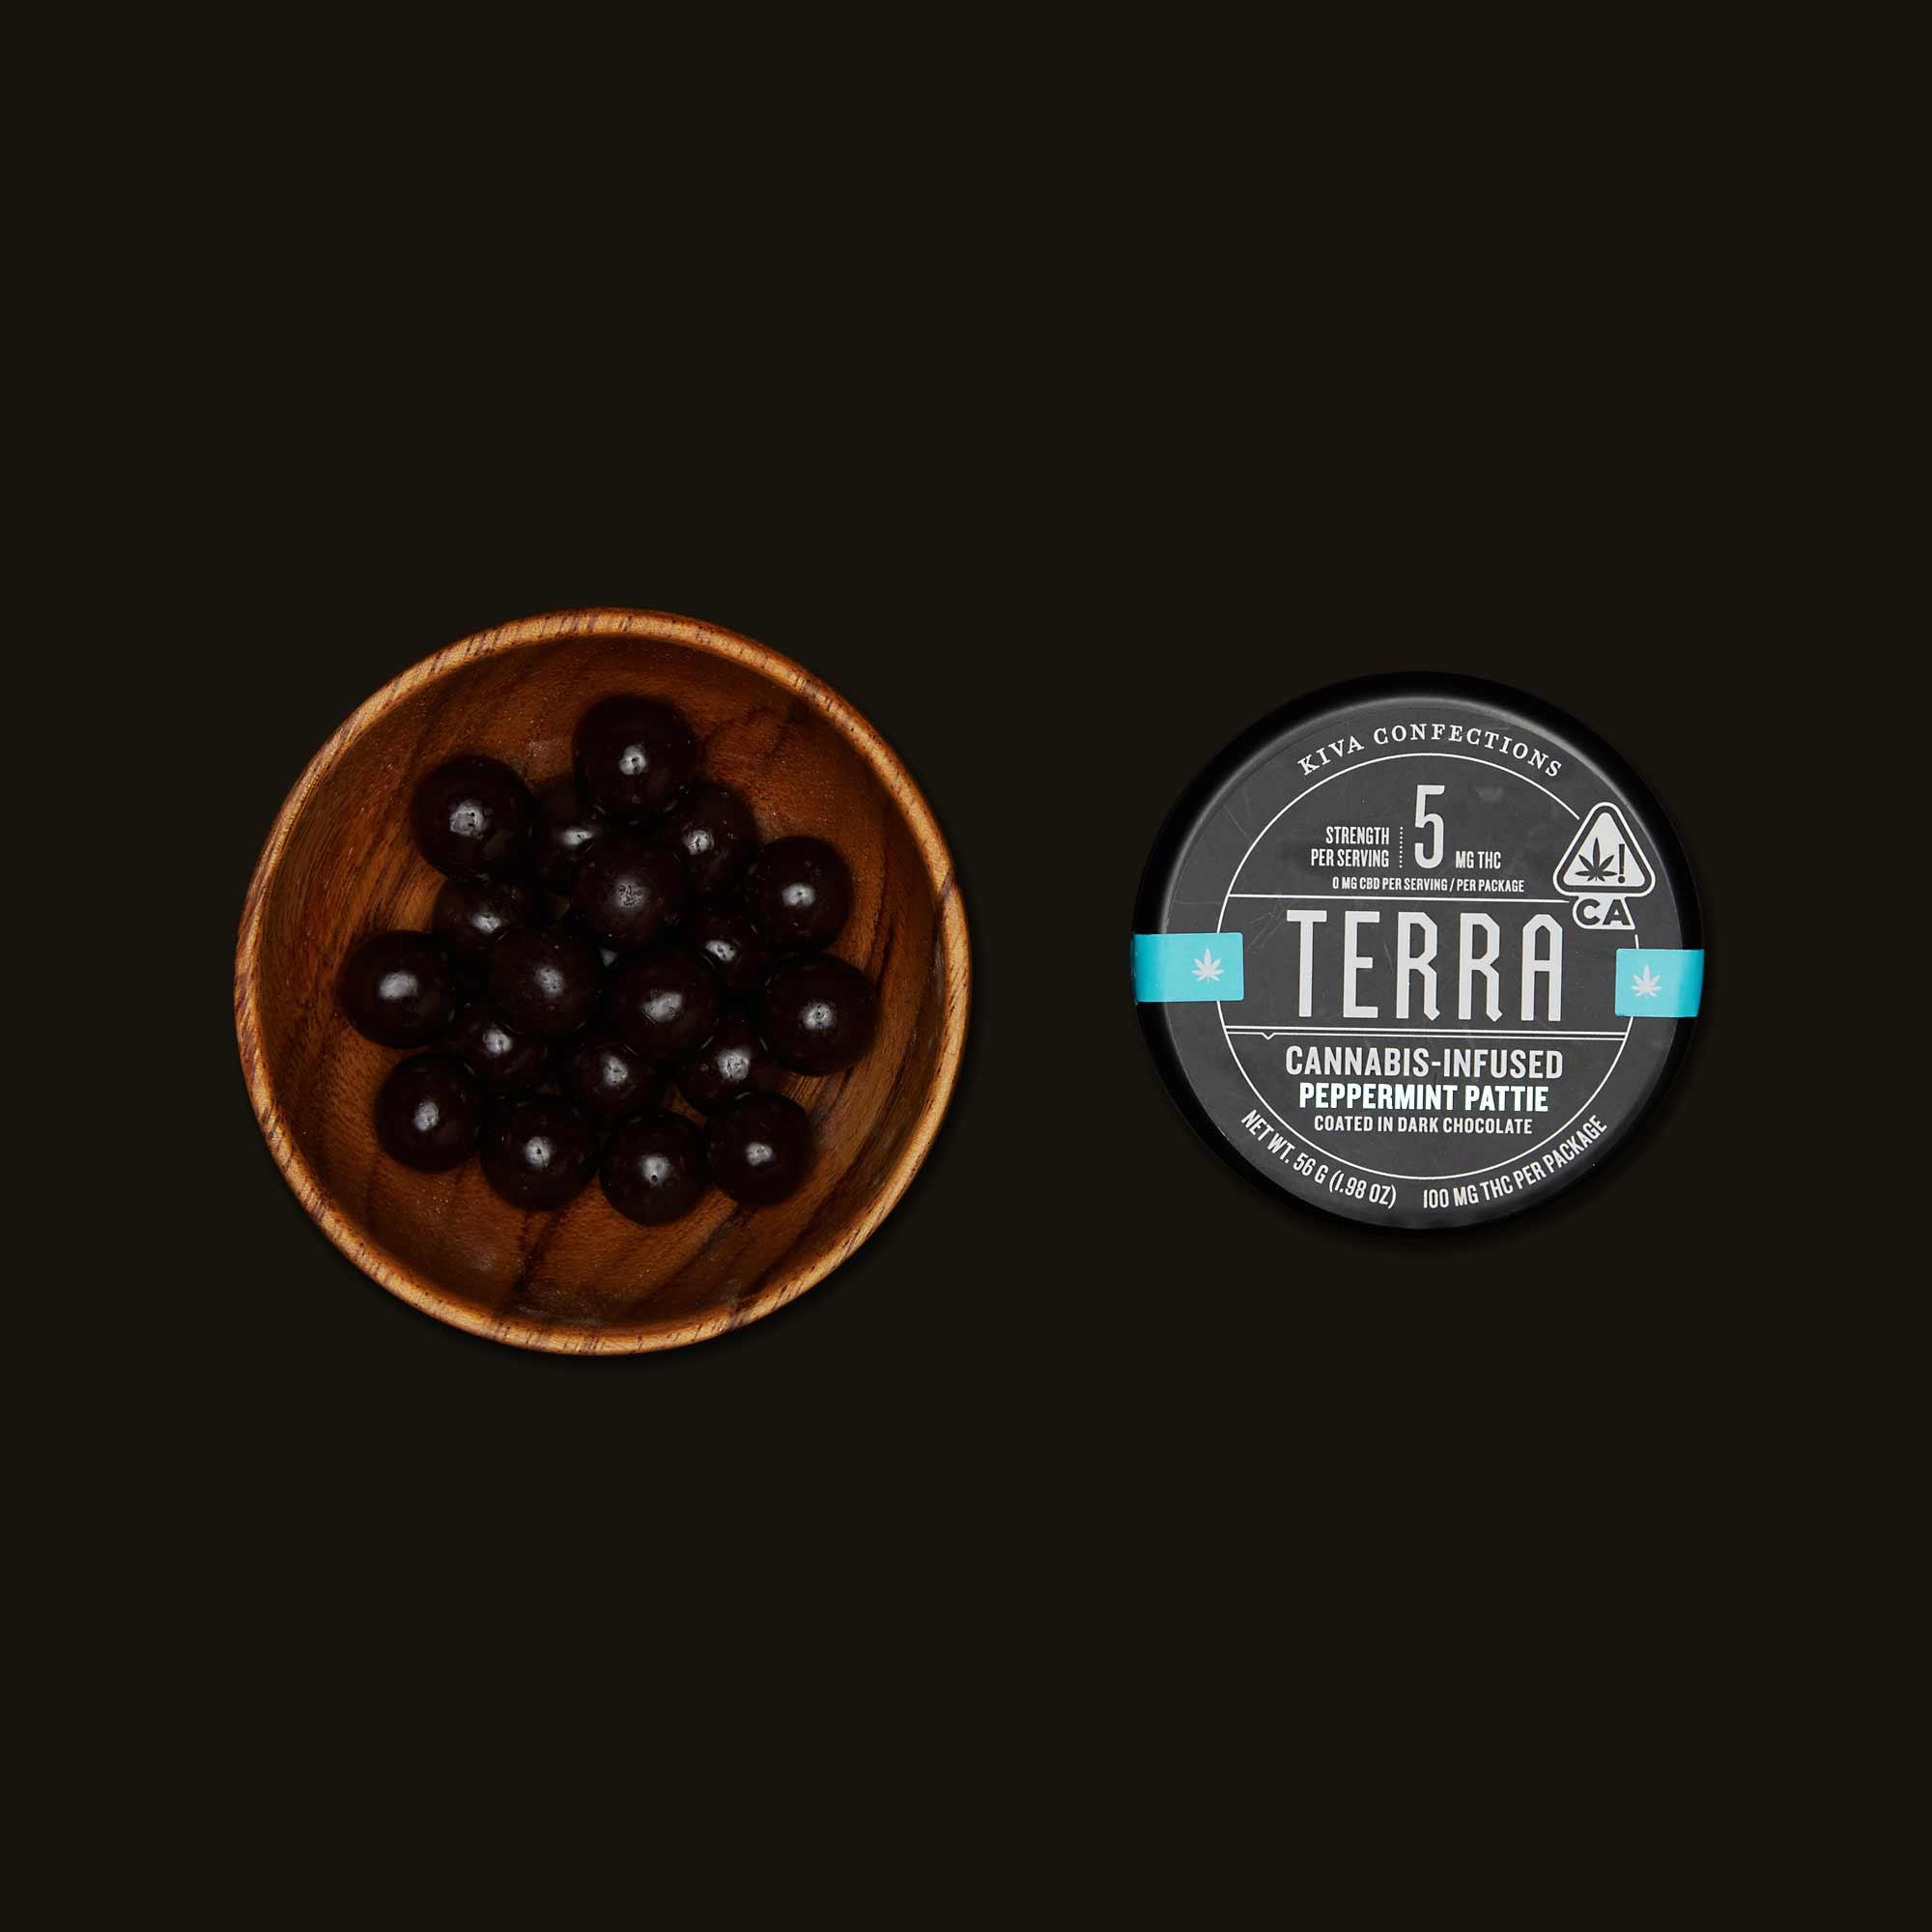 Kiva Confections Terra Peppermint Pattie Bites